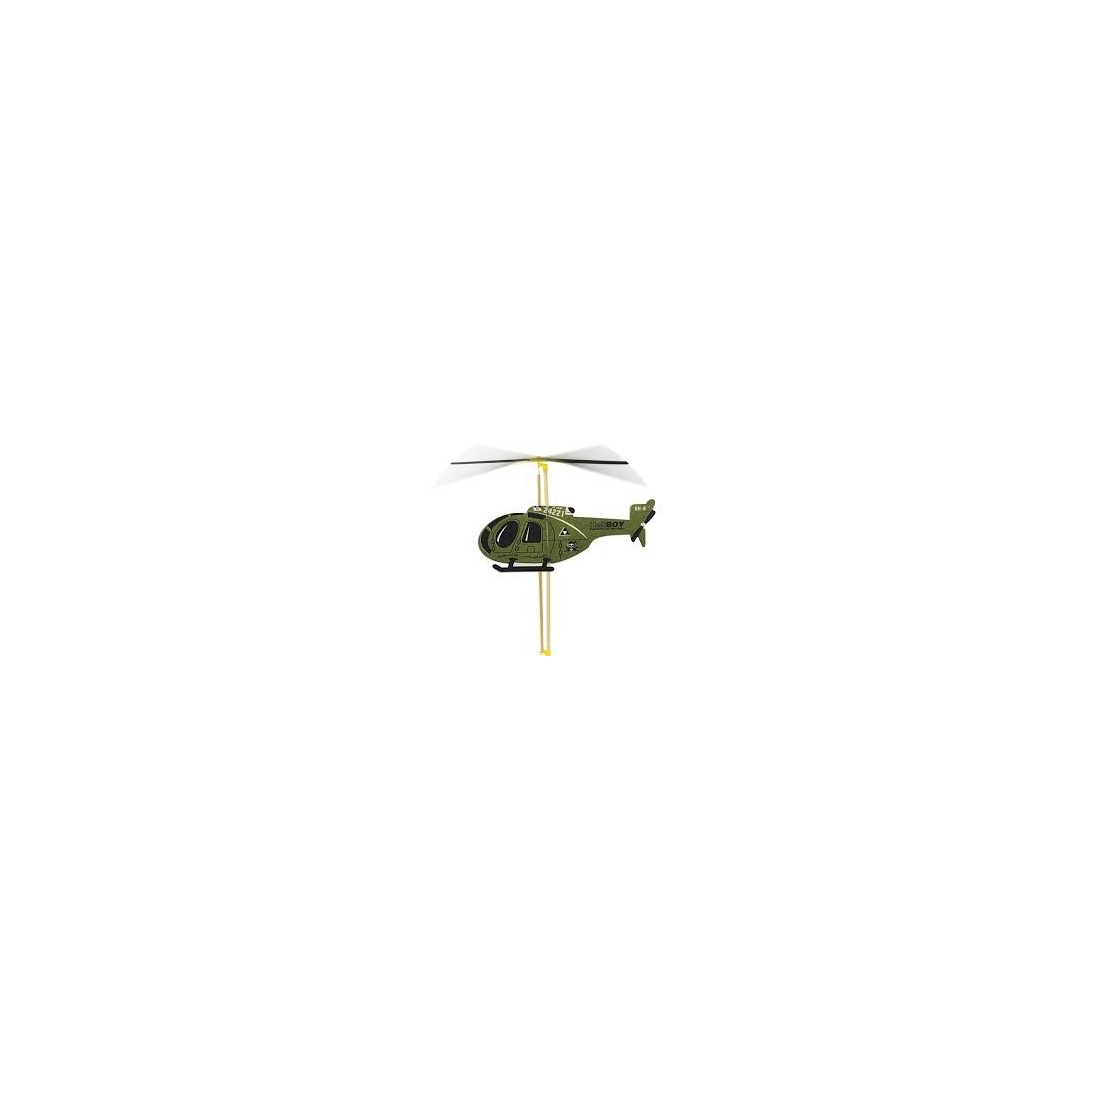 Elicottero Verde : Vilac modellismo elicottero verde a elastico